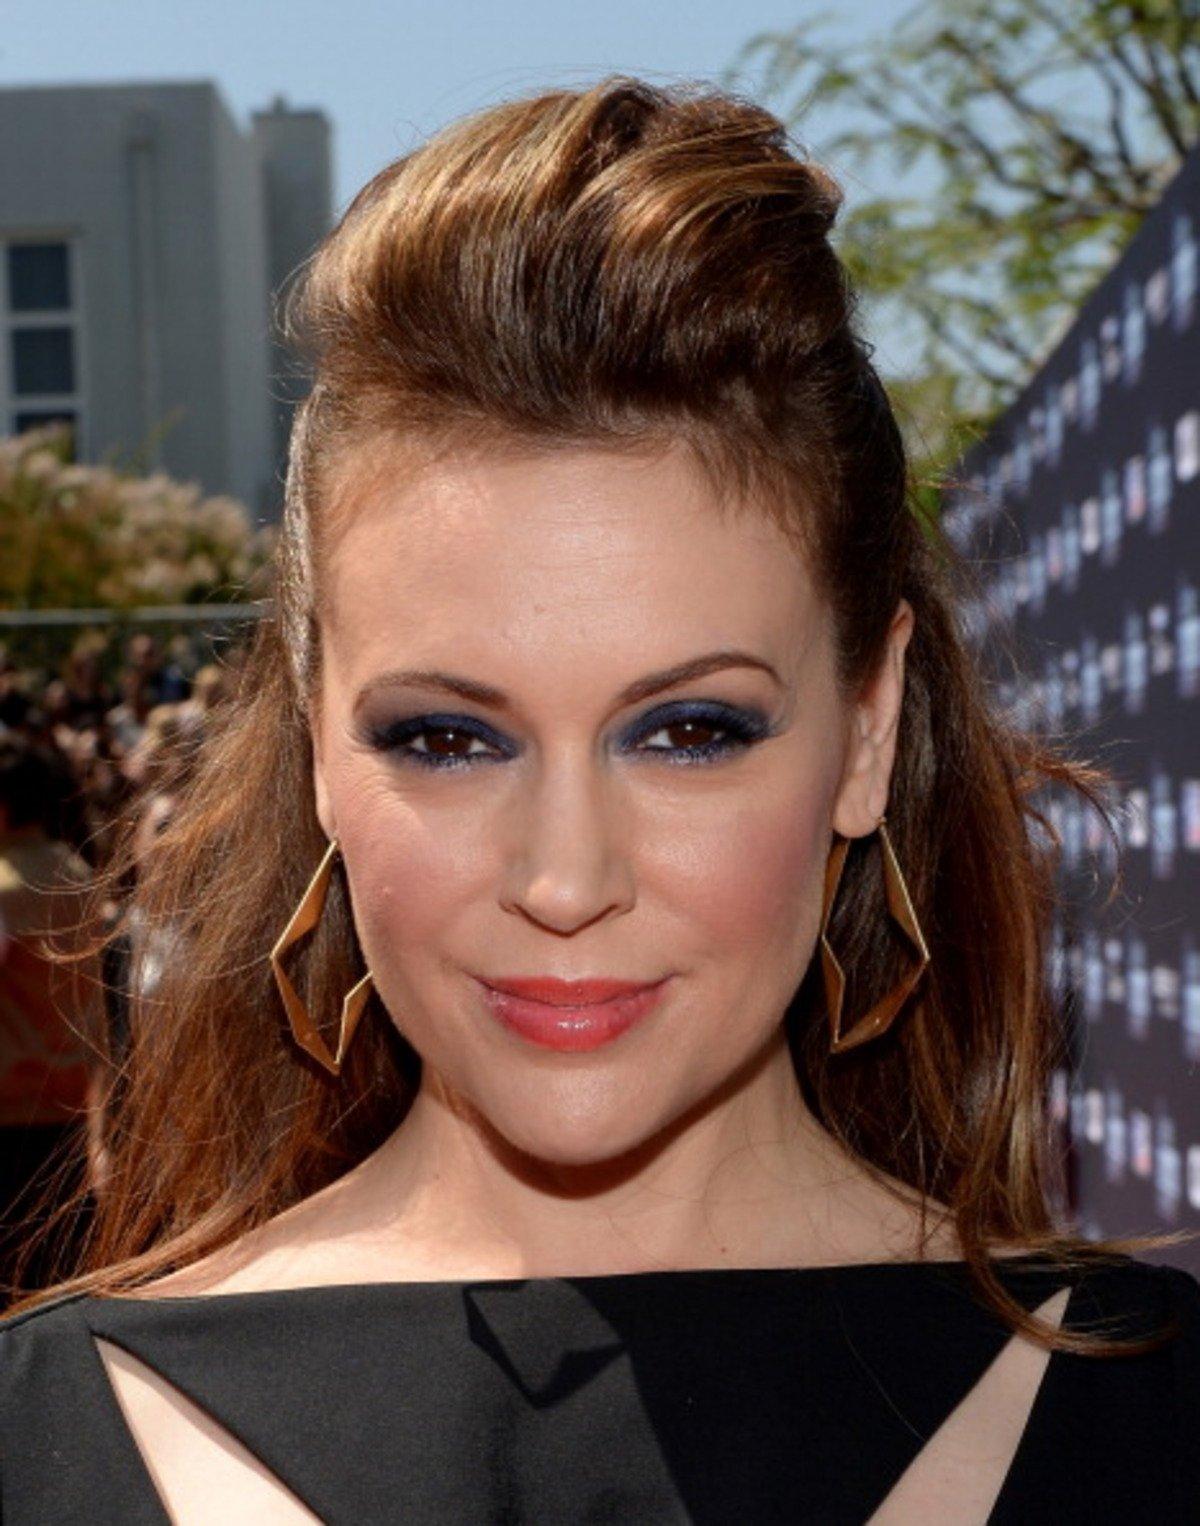 Alyssa Milano Embrace Of The Vampire alyssa milano net worth | celebrity net worth